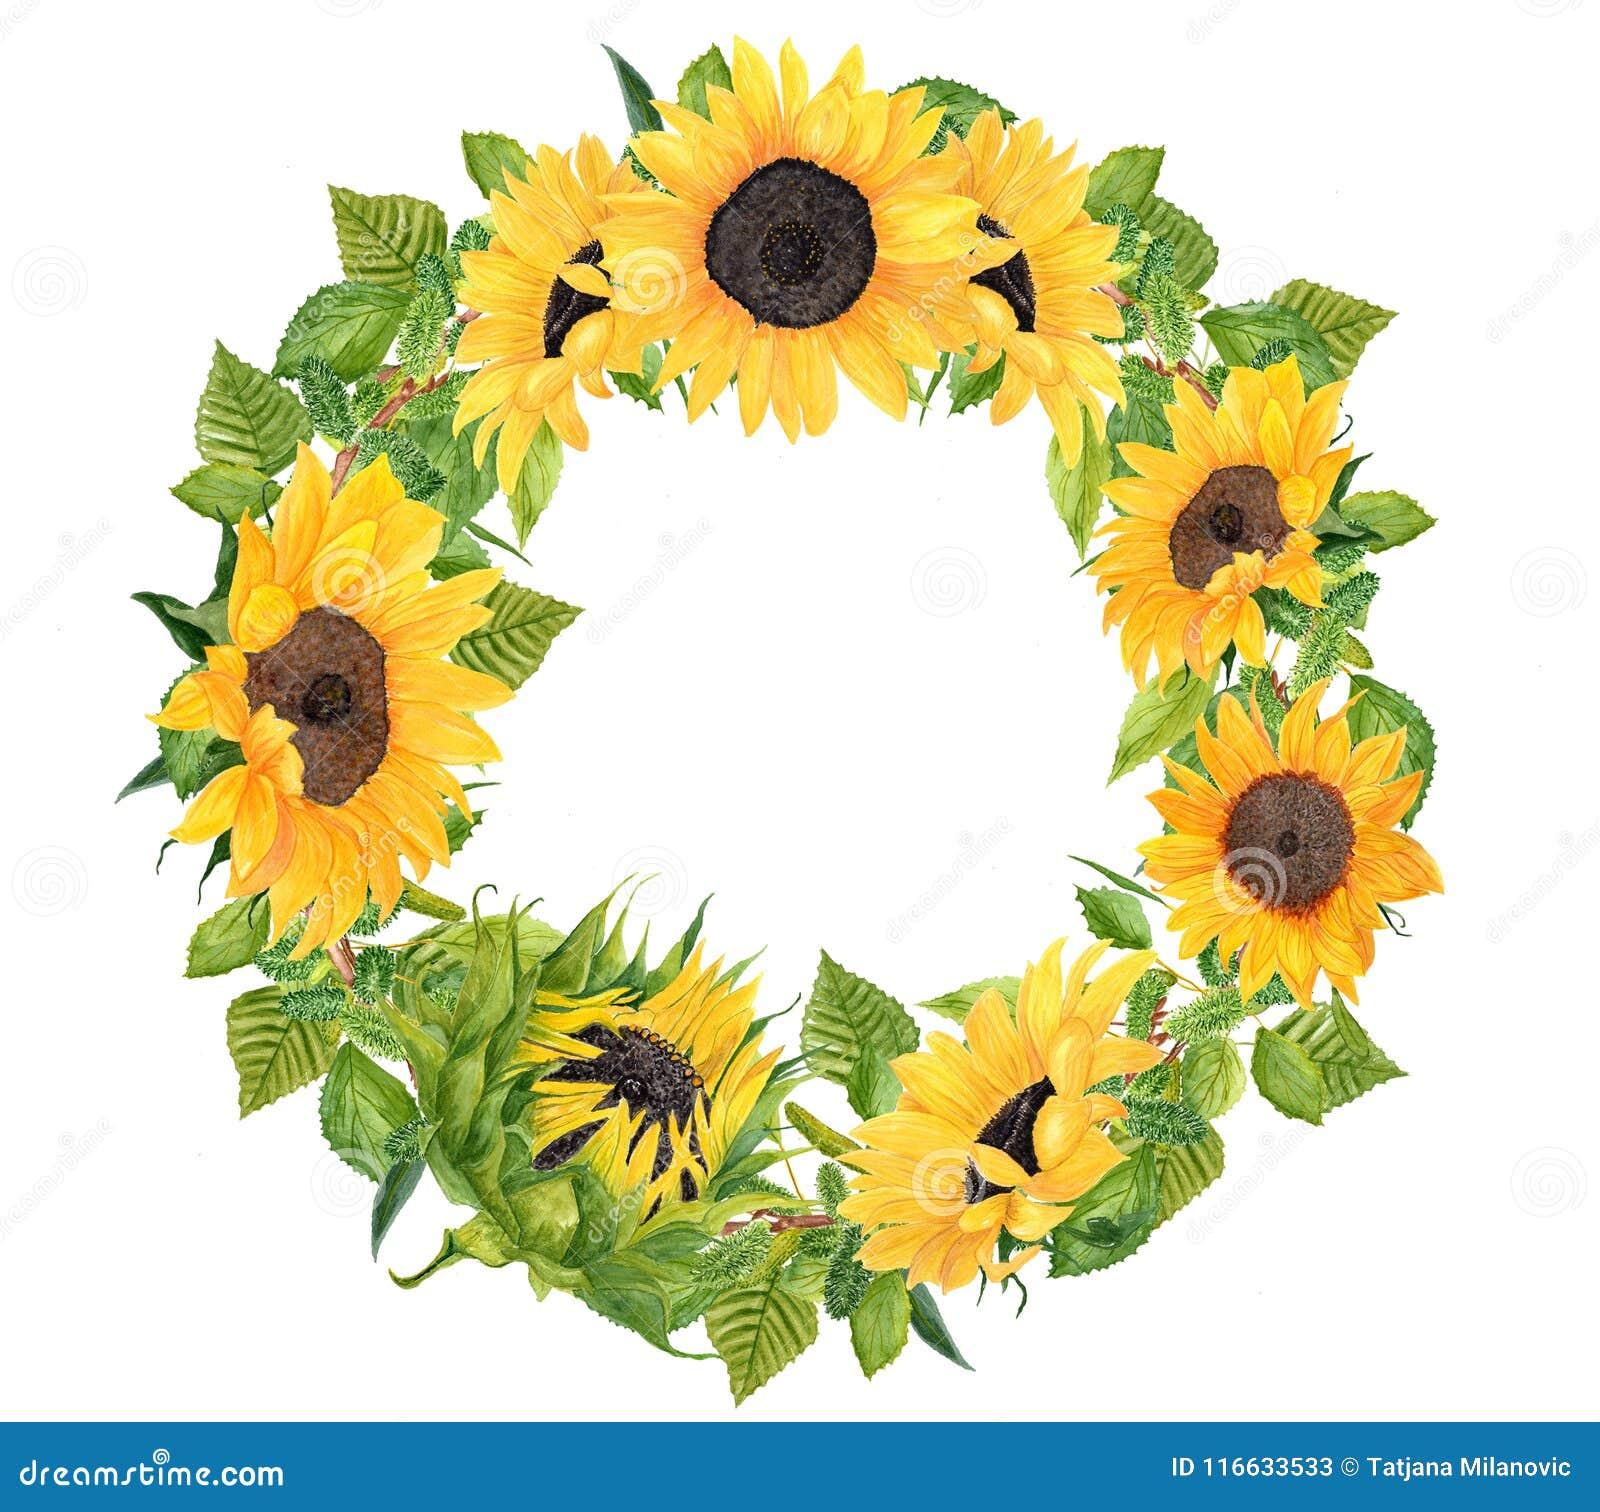 Sunflower Wreath Stock Illustrations 1 059 Sunflower Wreath Stock Illustrations Vectors Clipart Dreamstime